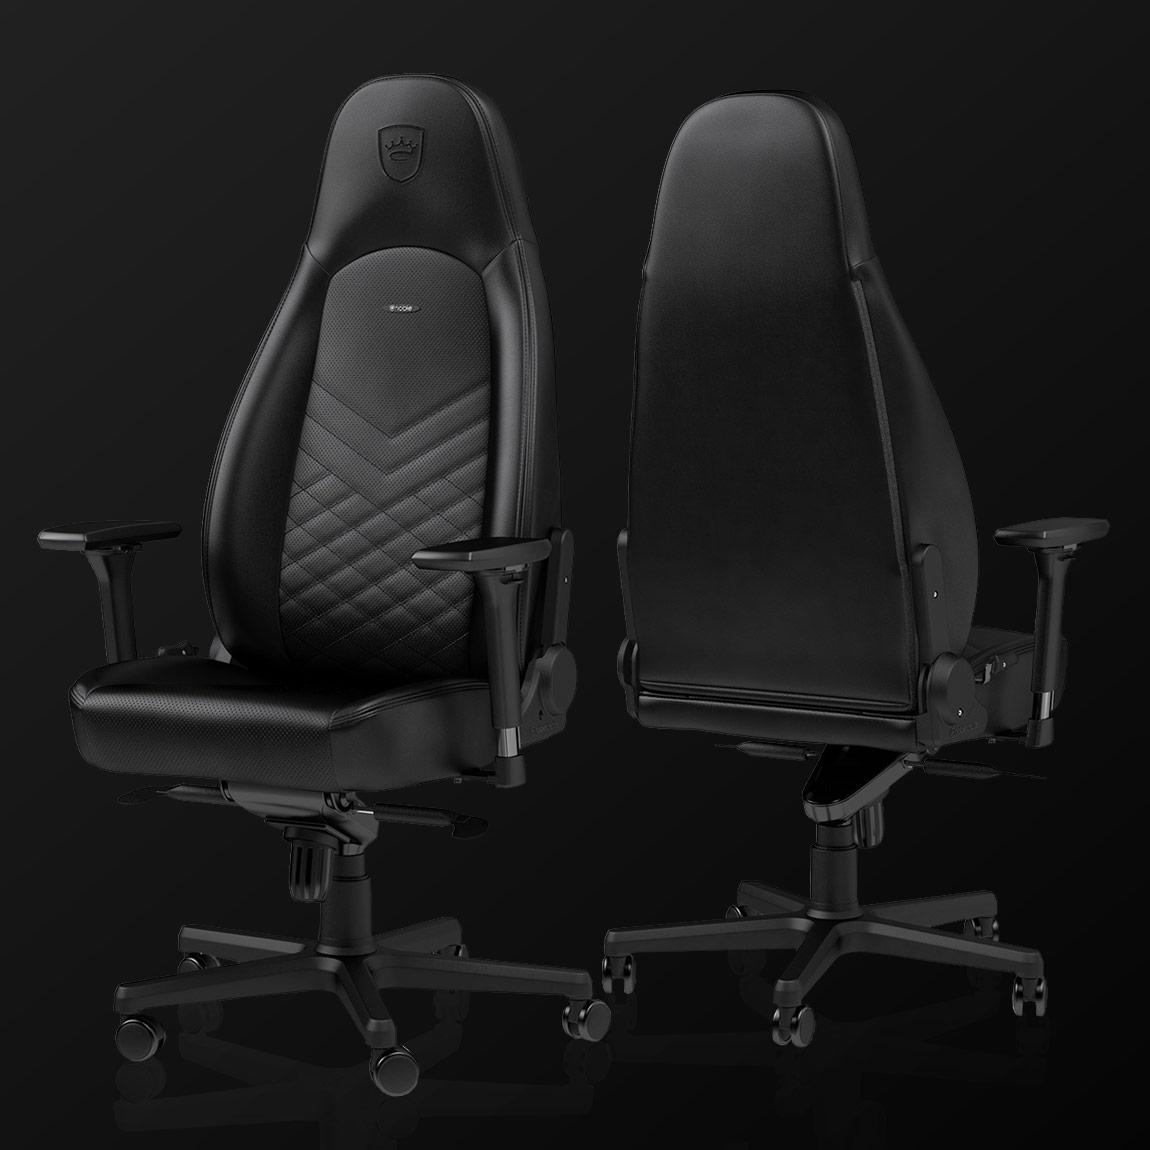 fotel dla gracza noblechairs ICON